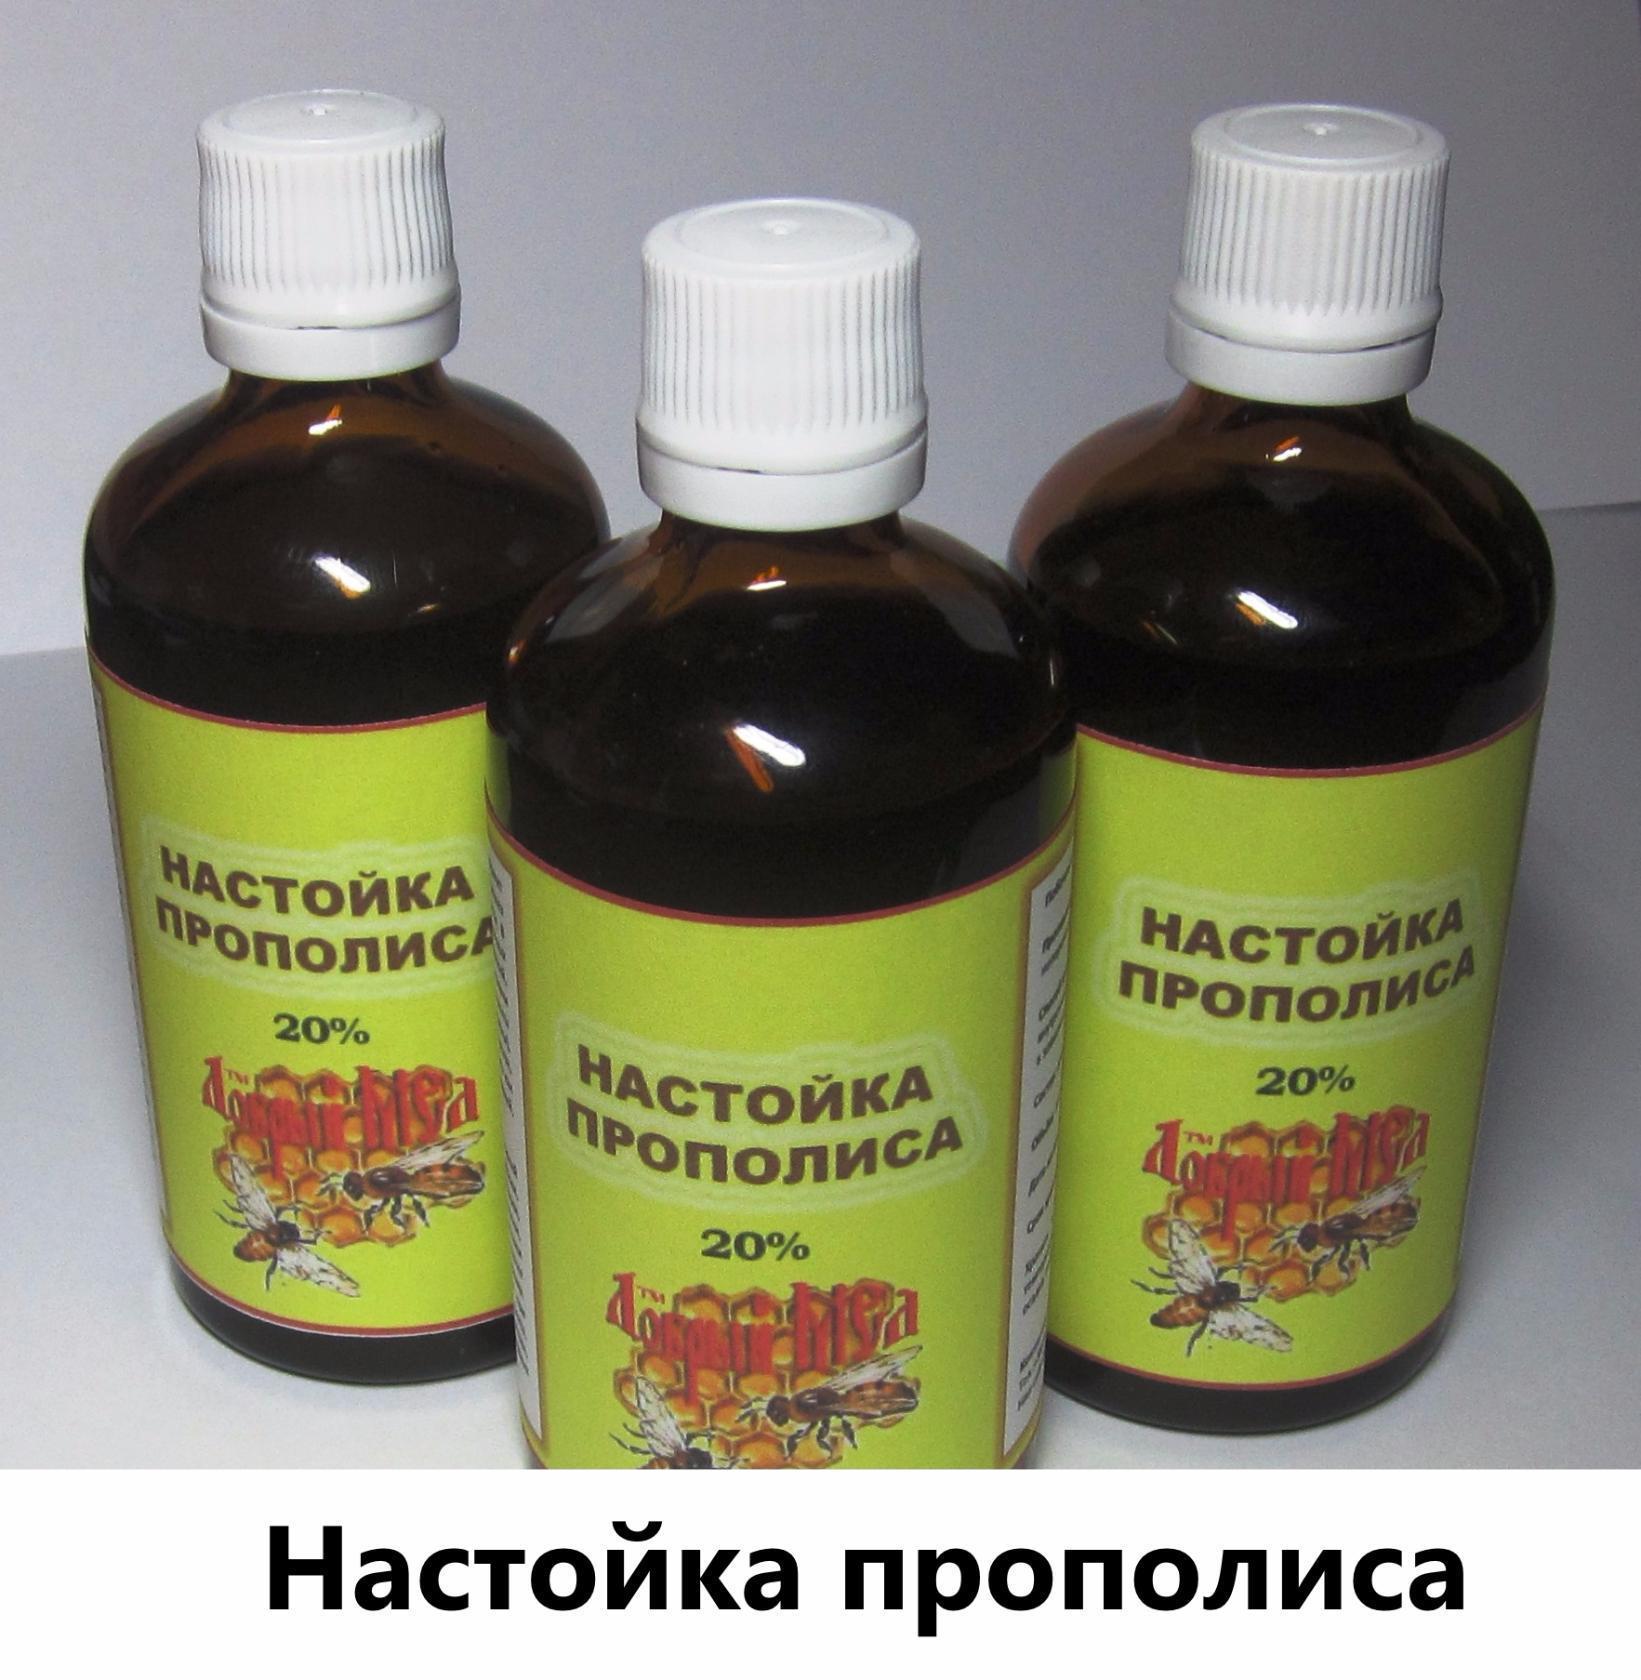 nastoyka-propolisa-s-molokom-pri-prostatite